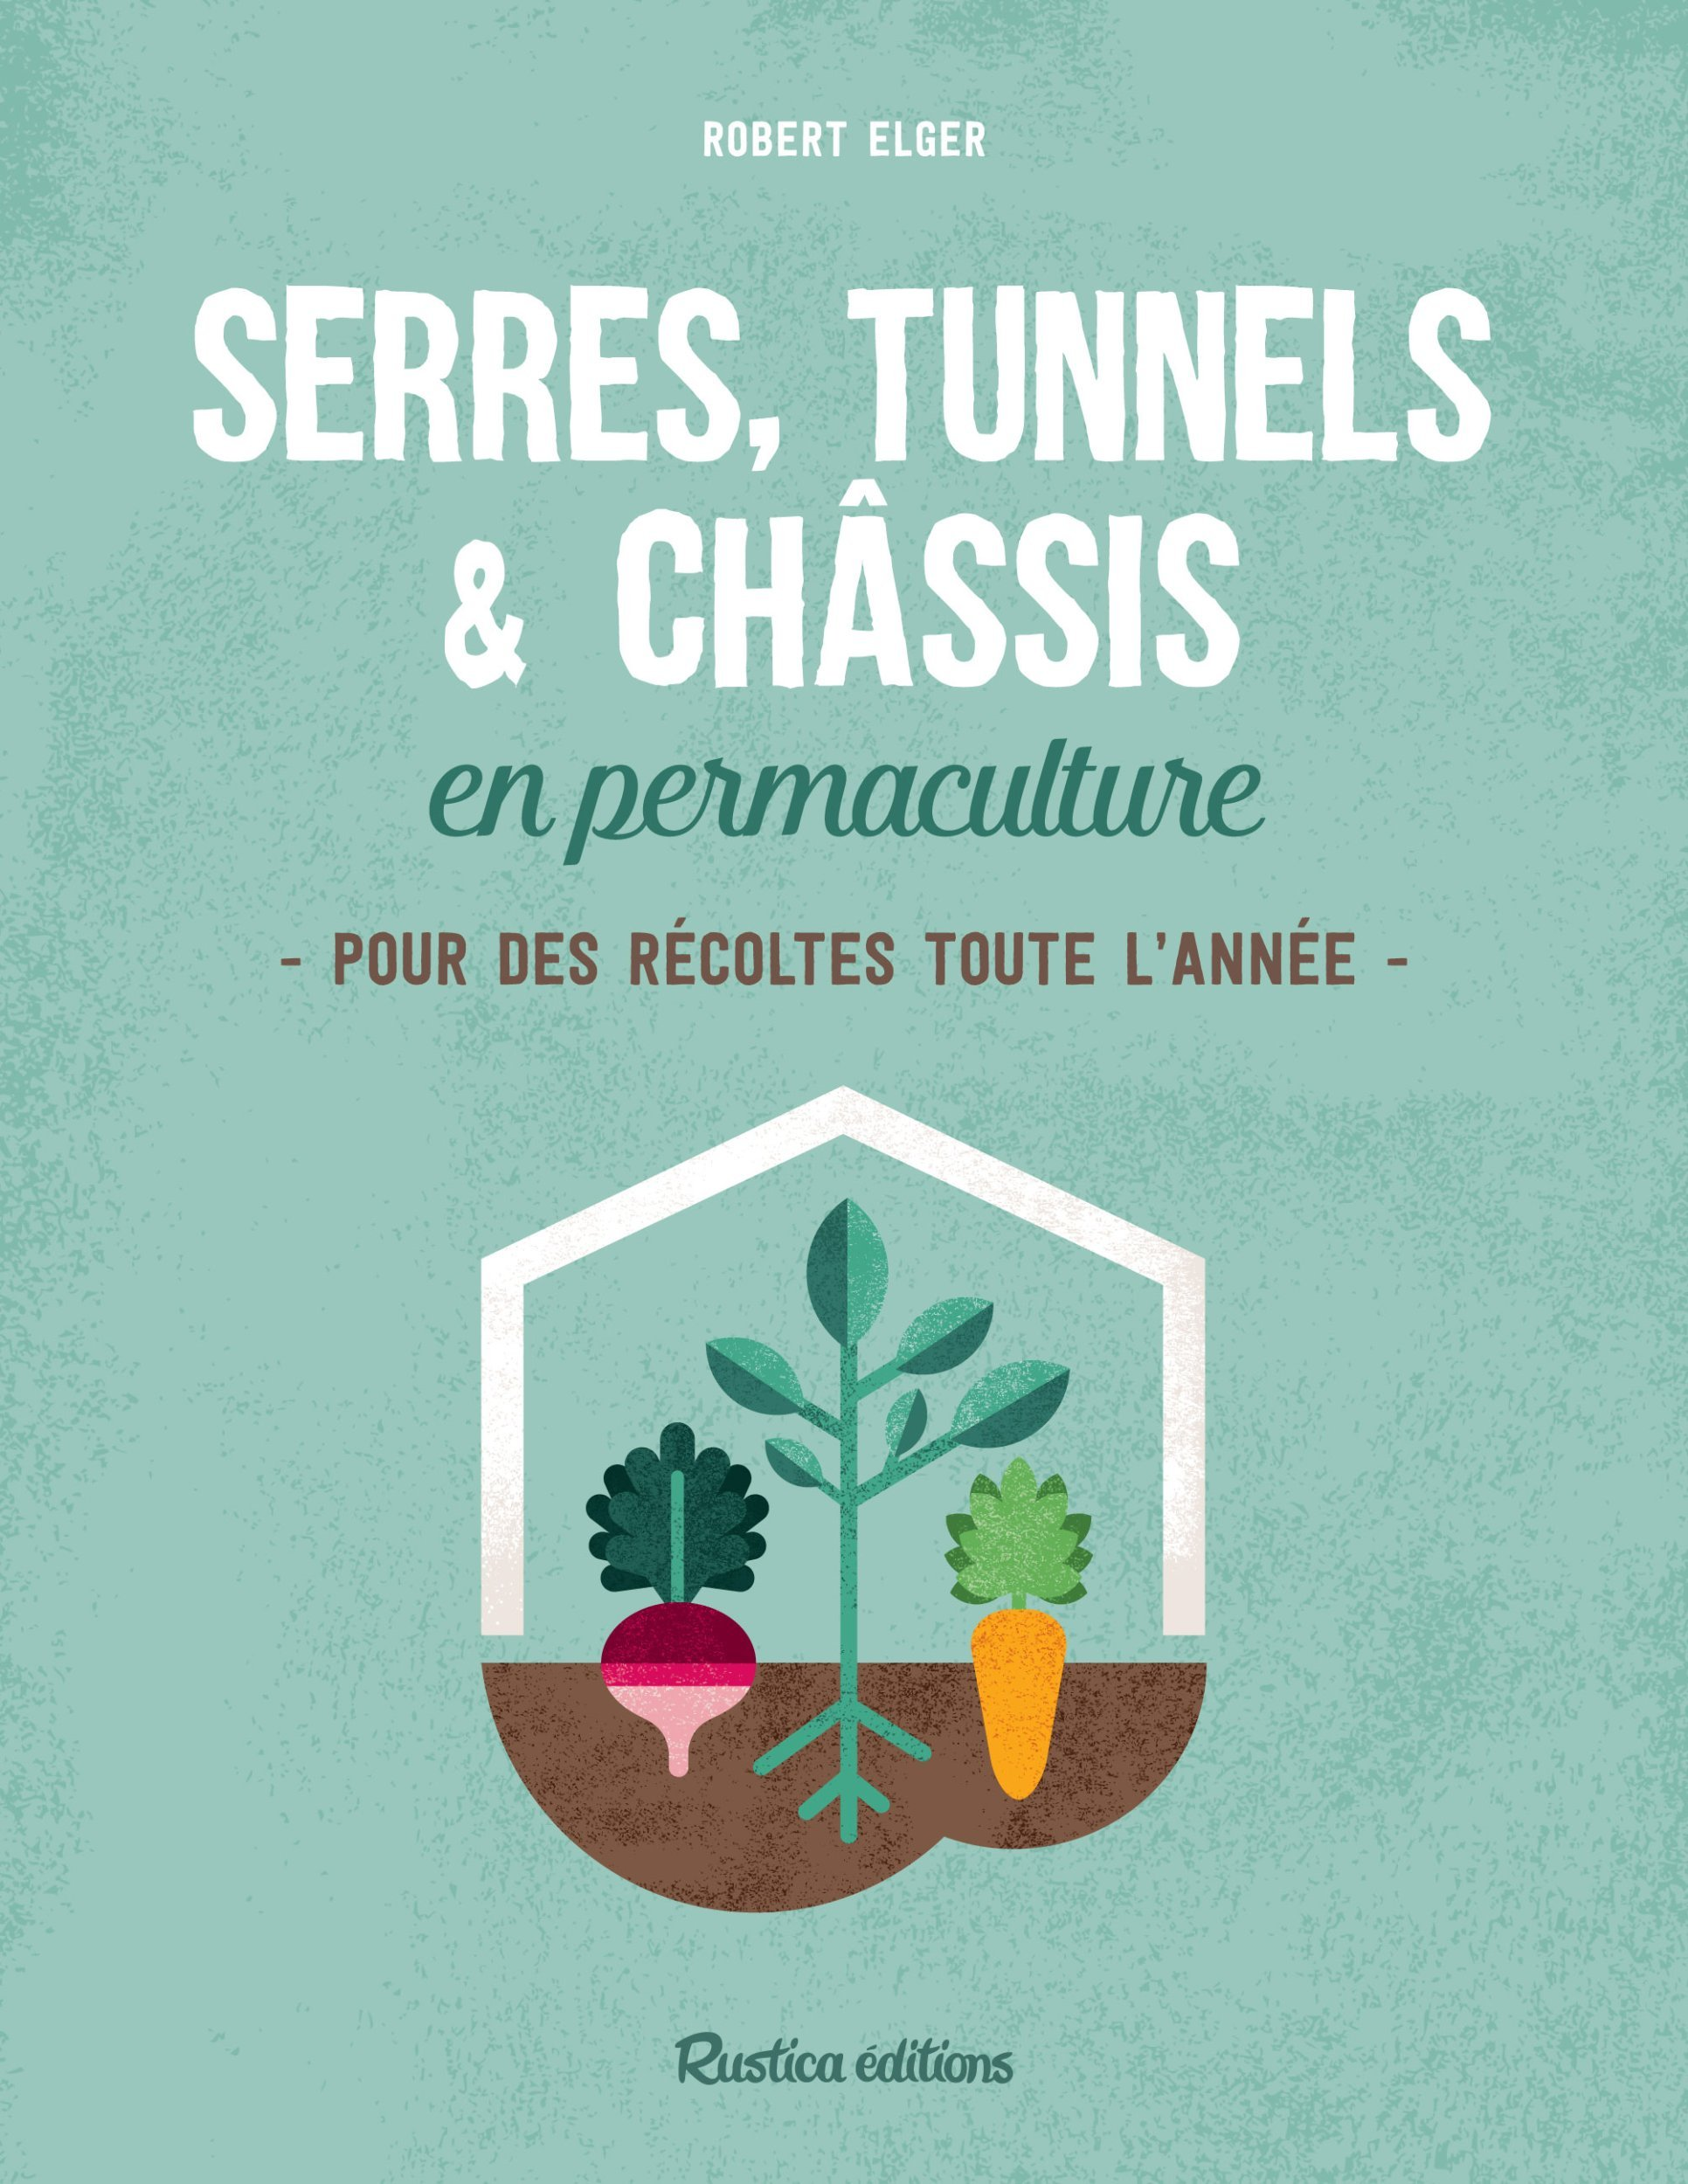 SERRES, TUNNELS ET CHASSIS EN PERMACULTURE